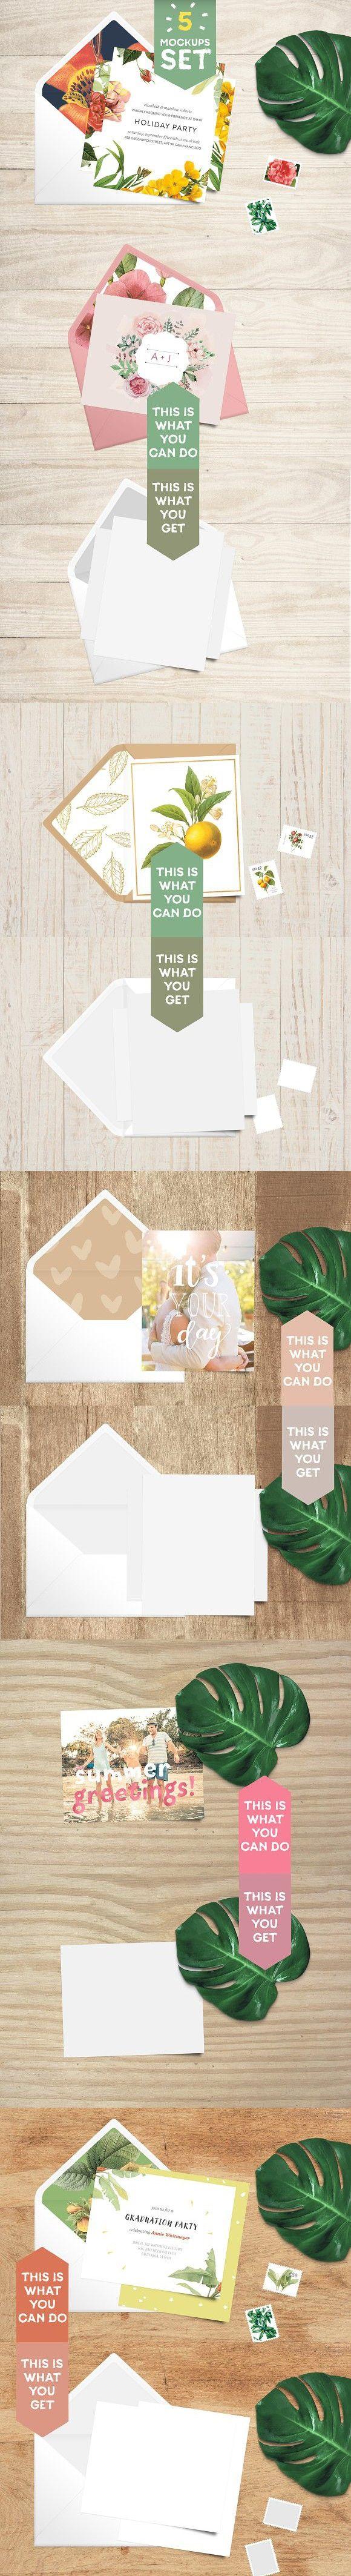 Card + Envelope 5 Mockups Set. Wedding Card Templates